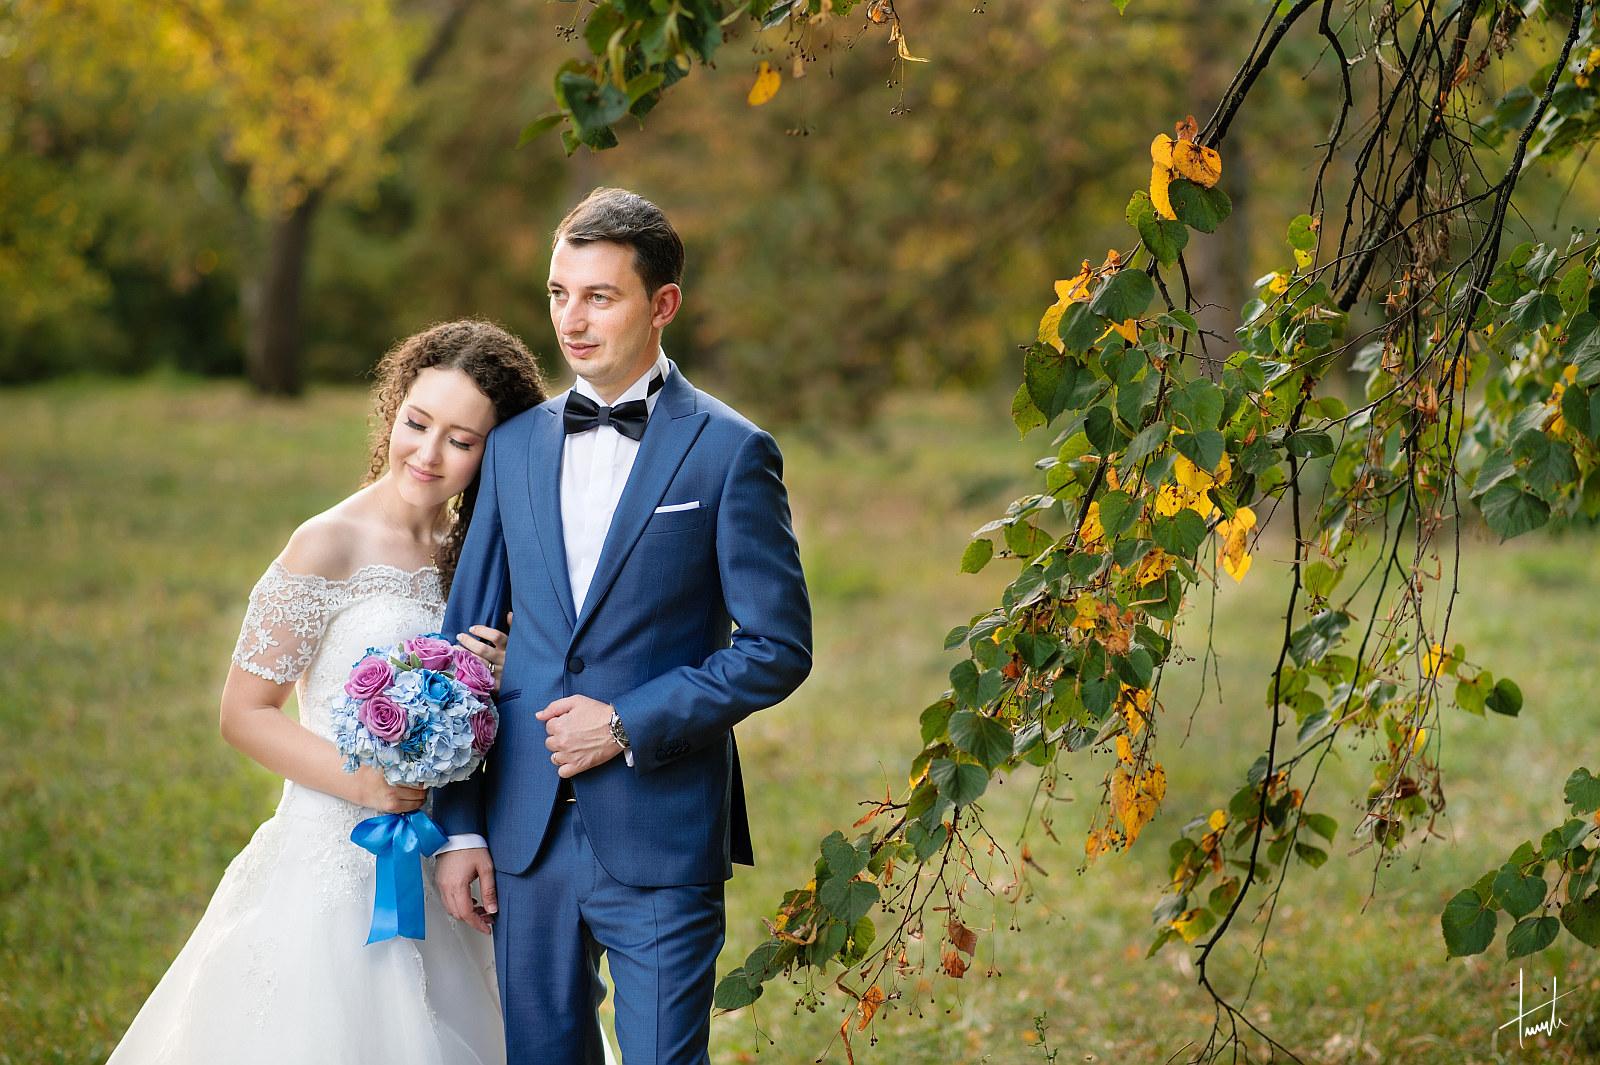 fotografie de nunta - Martha Ionut 06